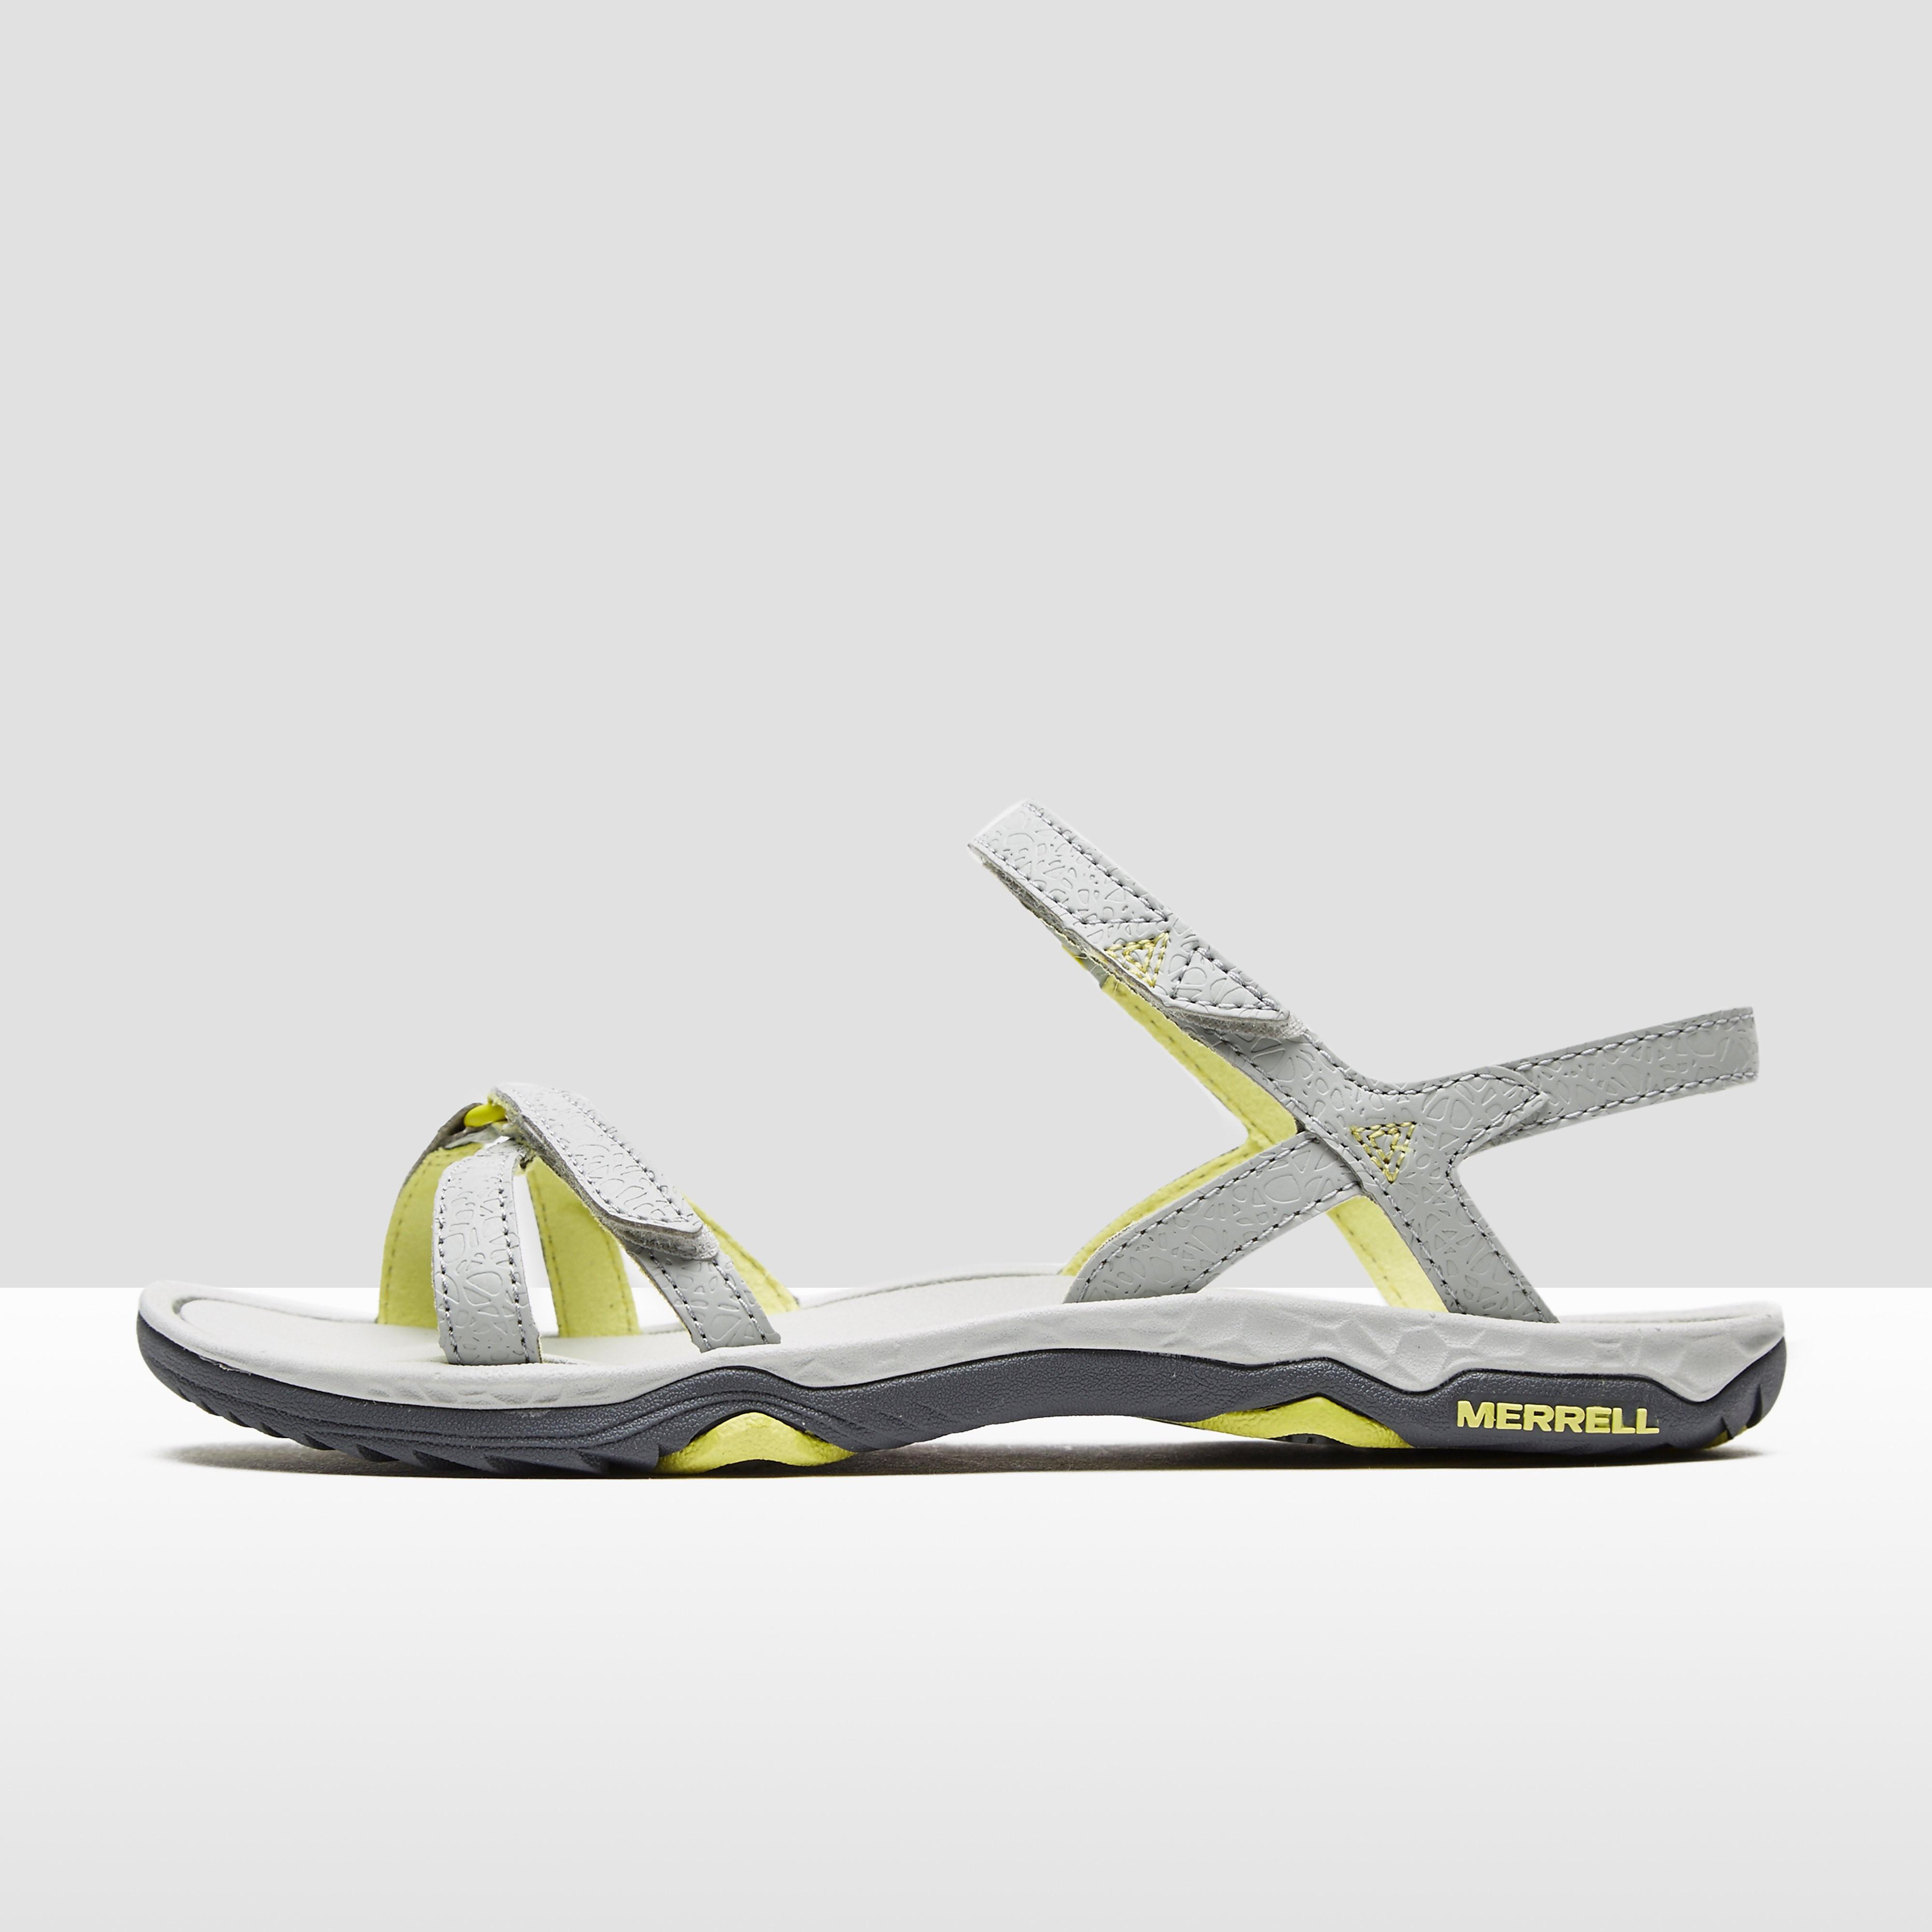 Merrell Enoki 2 Strap Women's Sandals